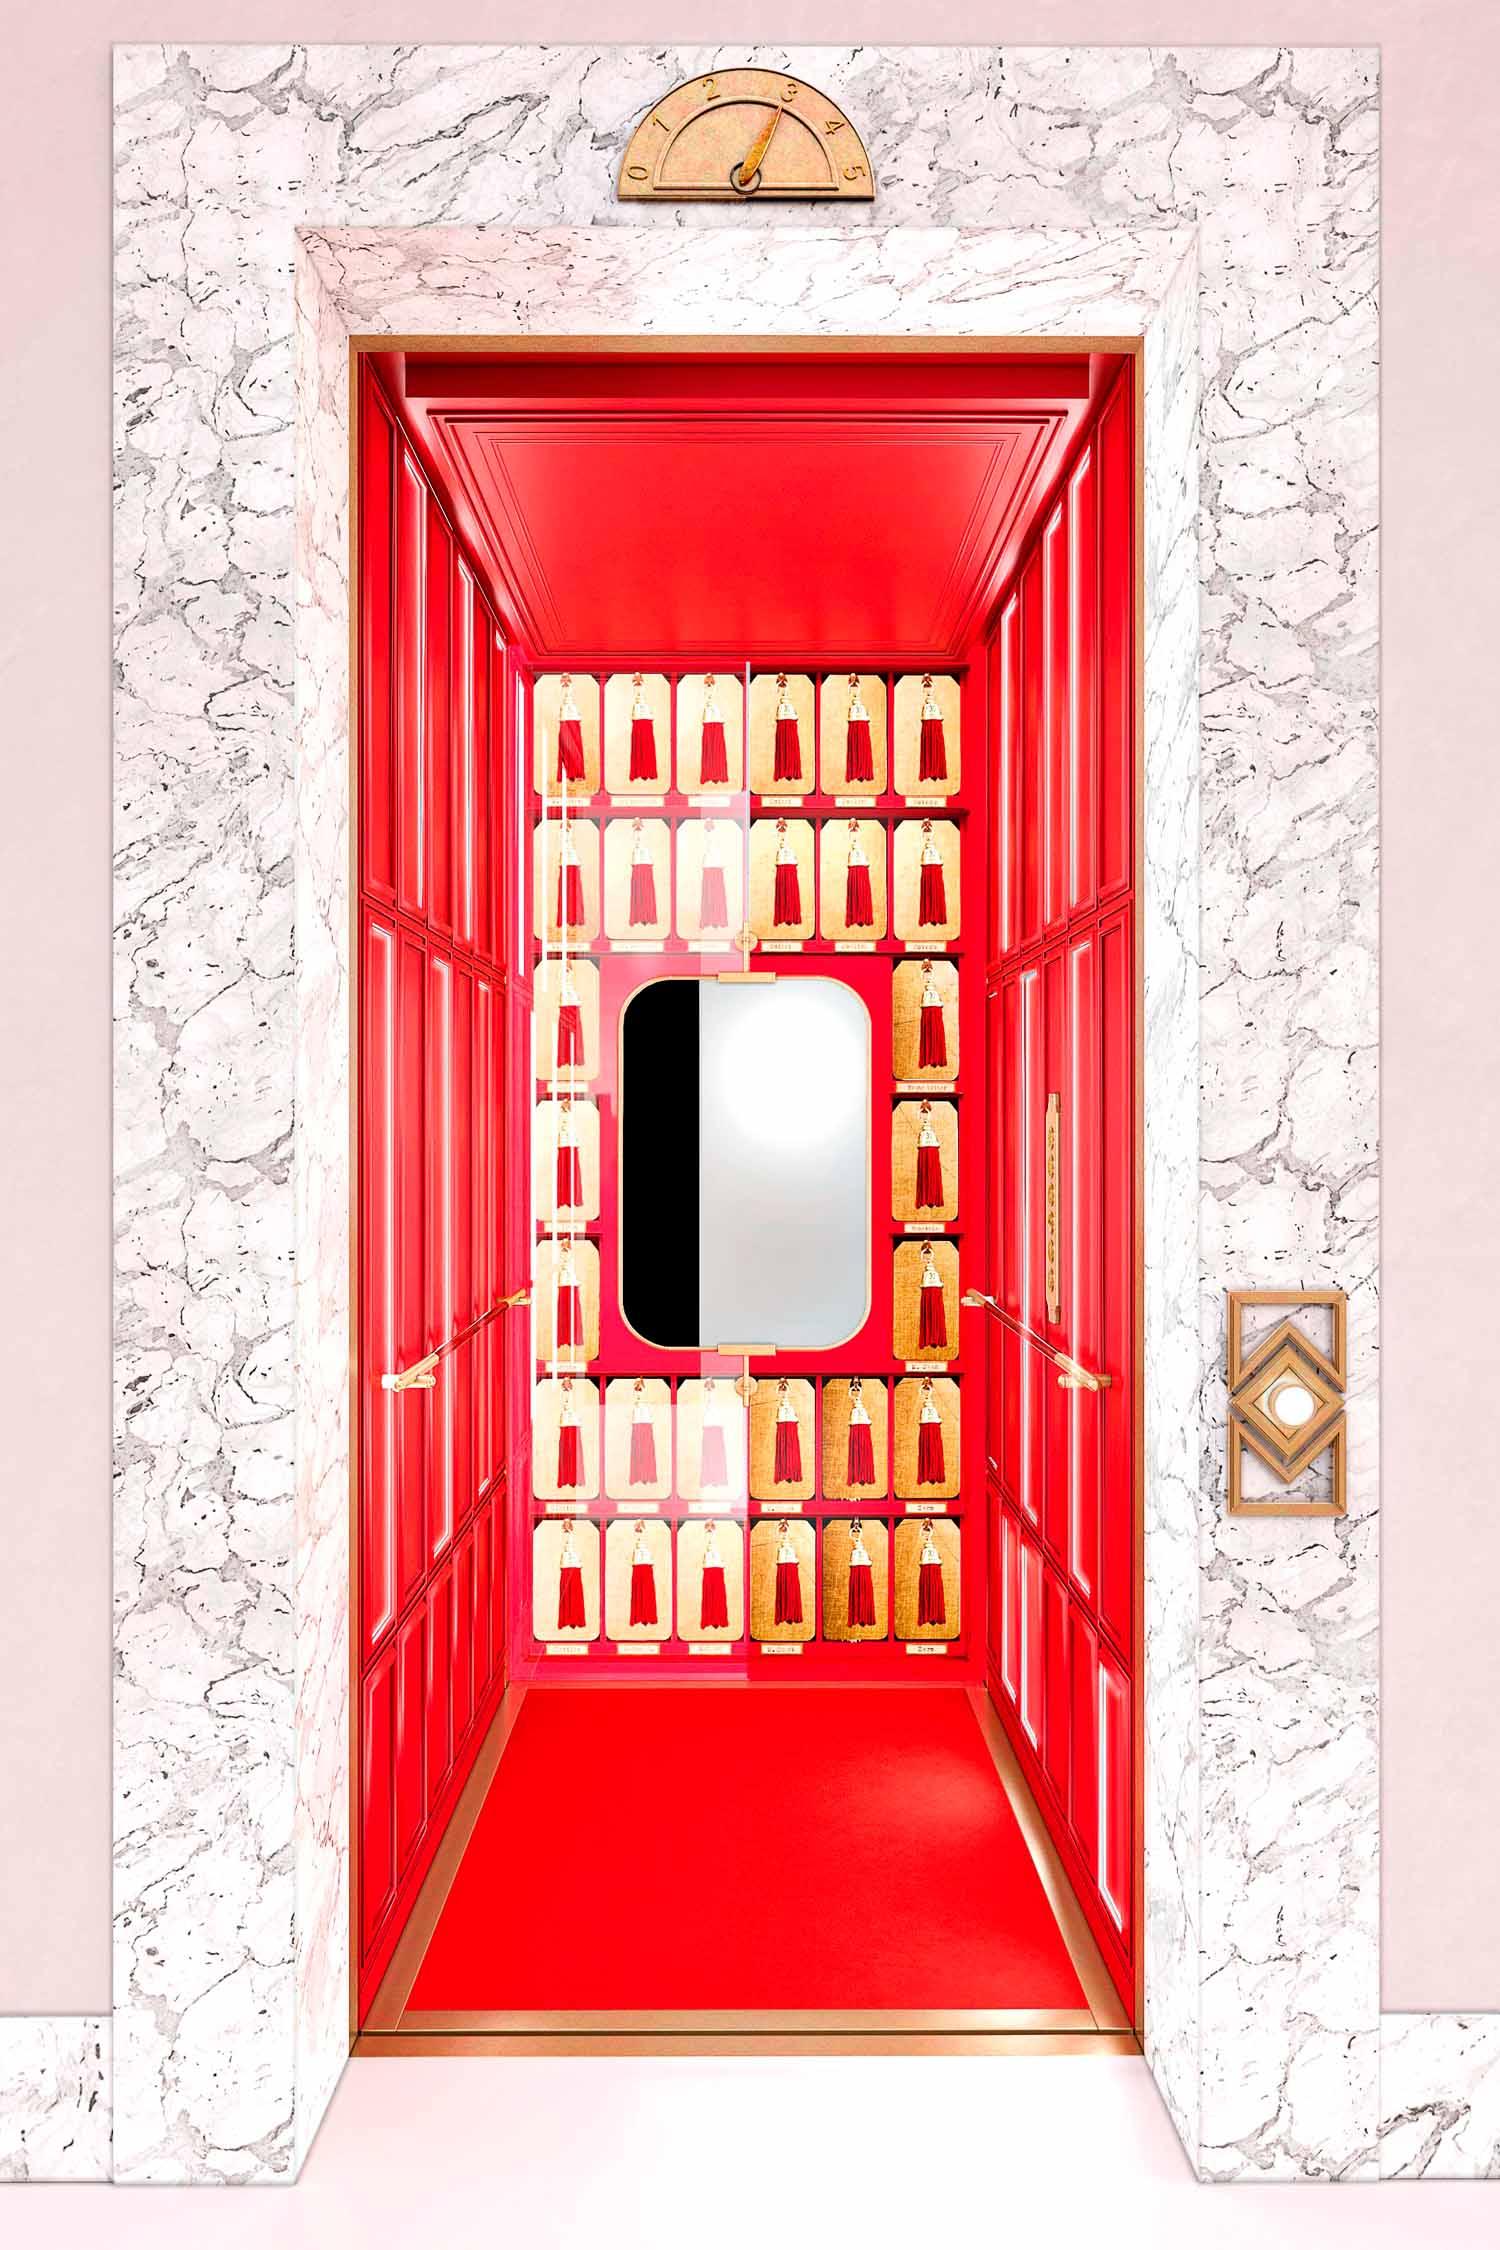 Courtesy IGV Group Linea Ad Hoc, Cabina ascensore Pop Up, CaberlonCaroppi